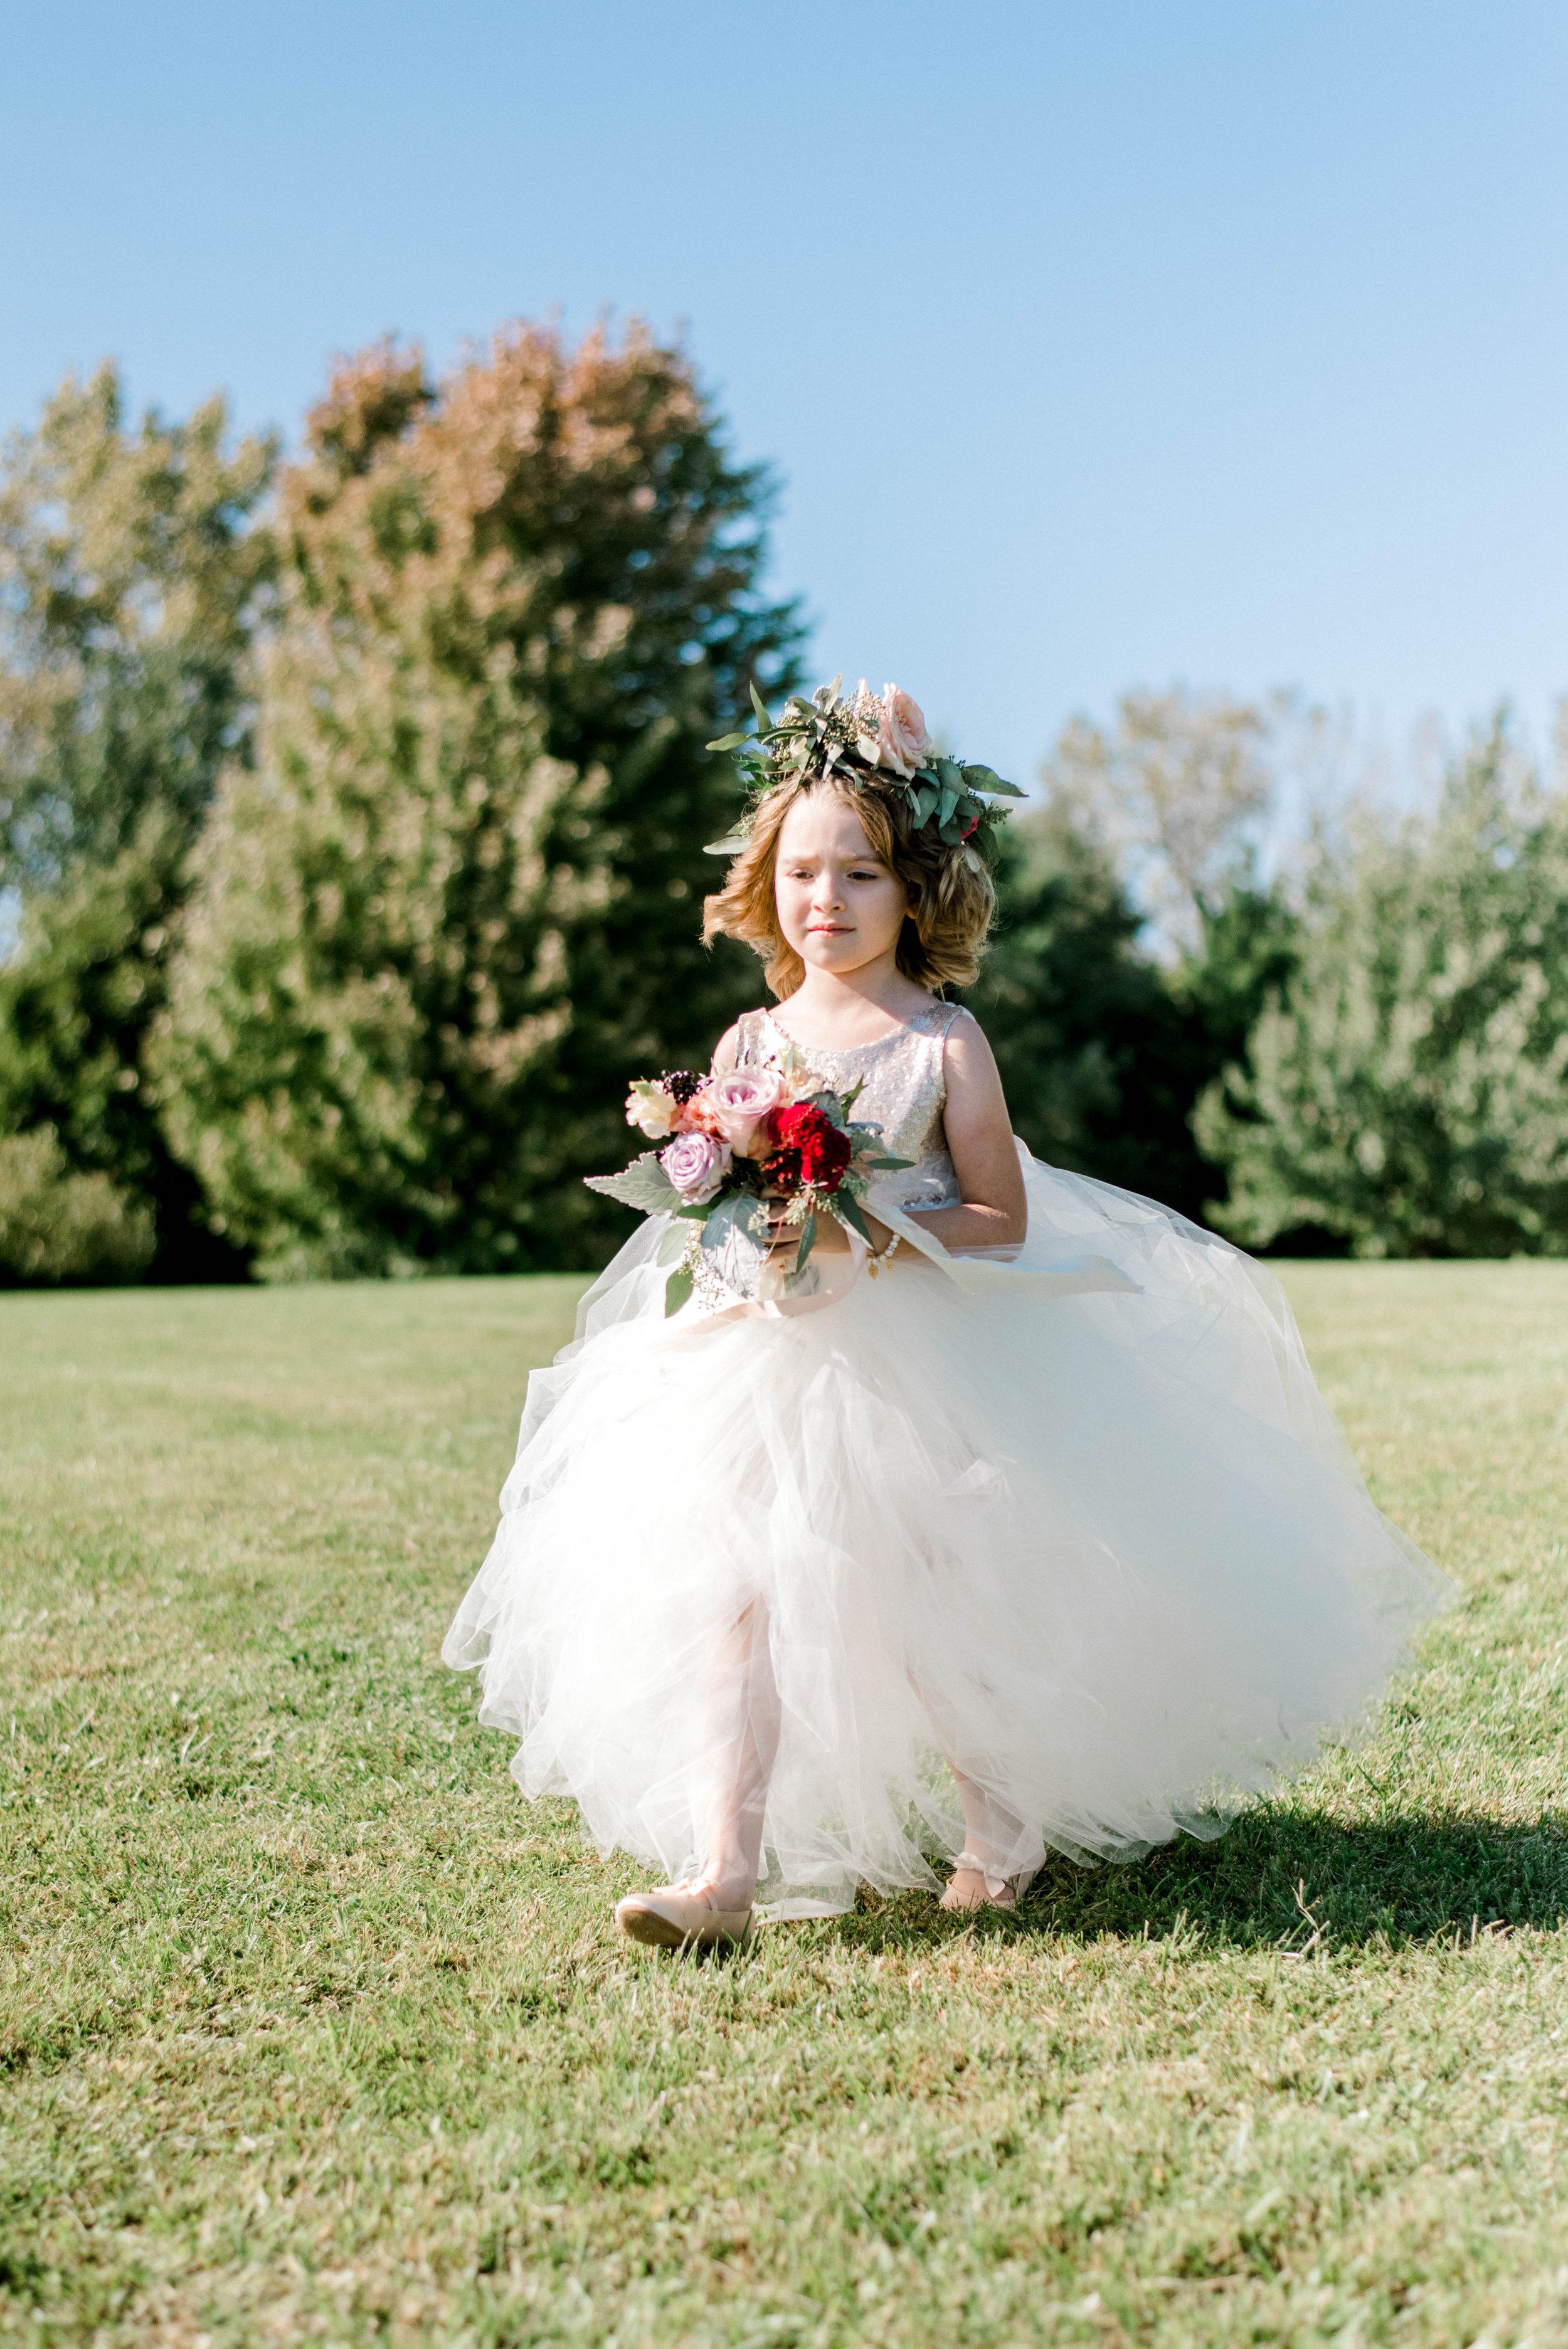 Ryan Alexa Married-Formals Ceremony-0127.jpg